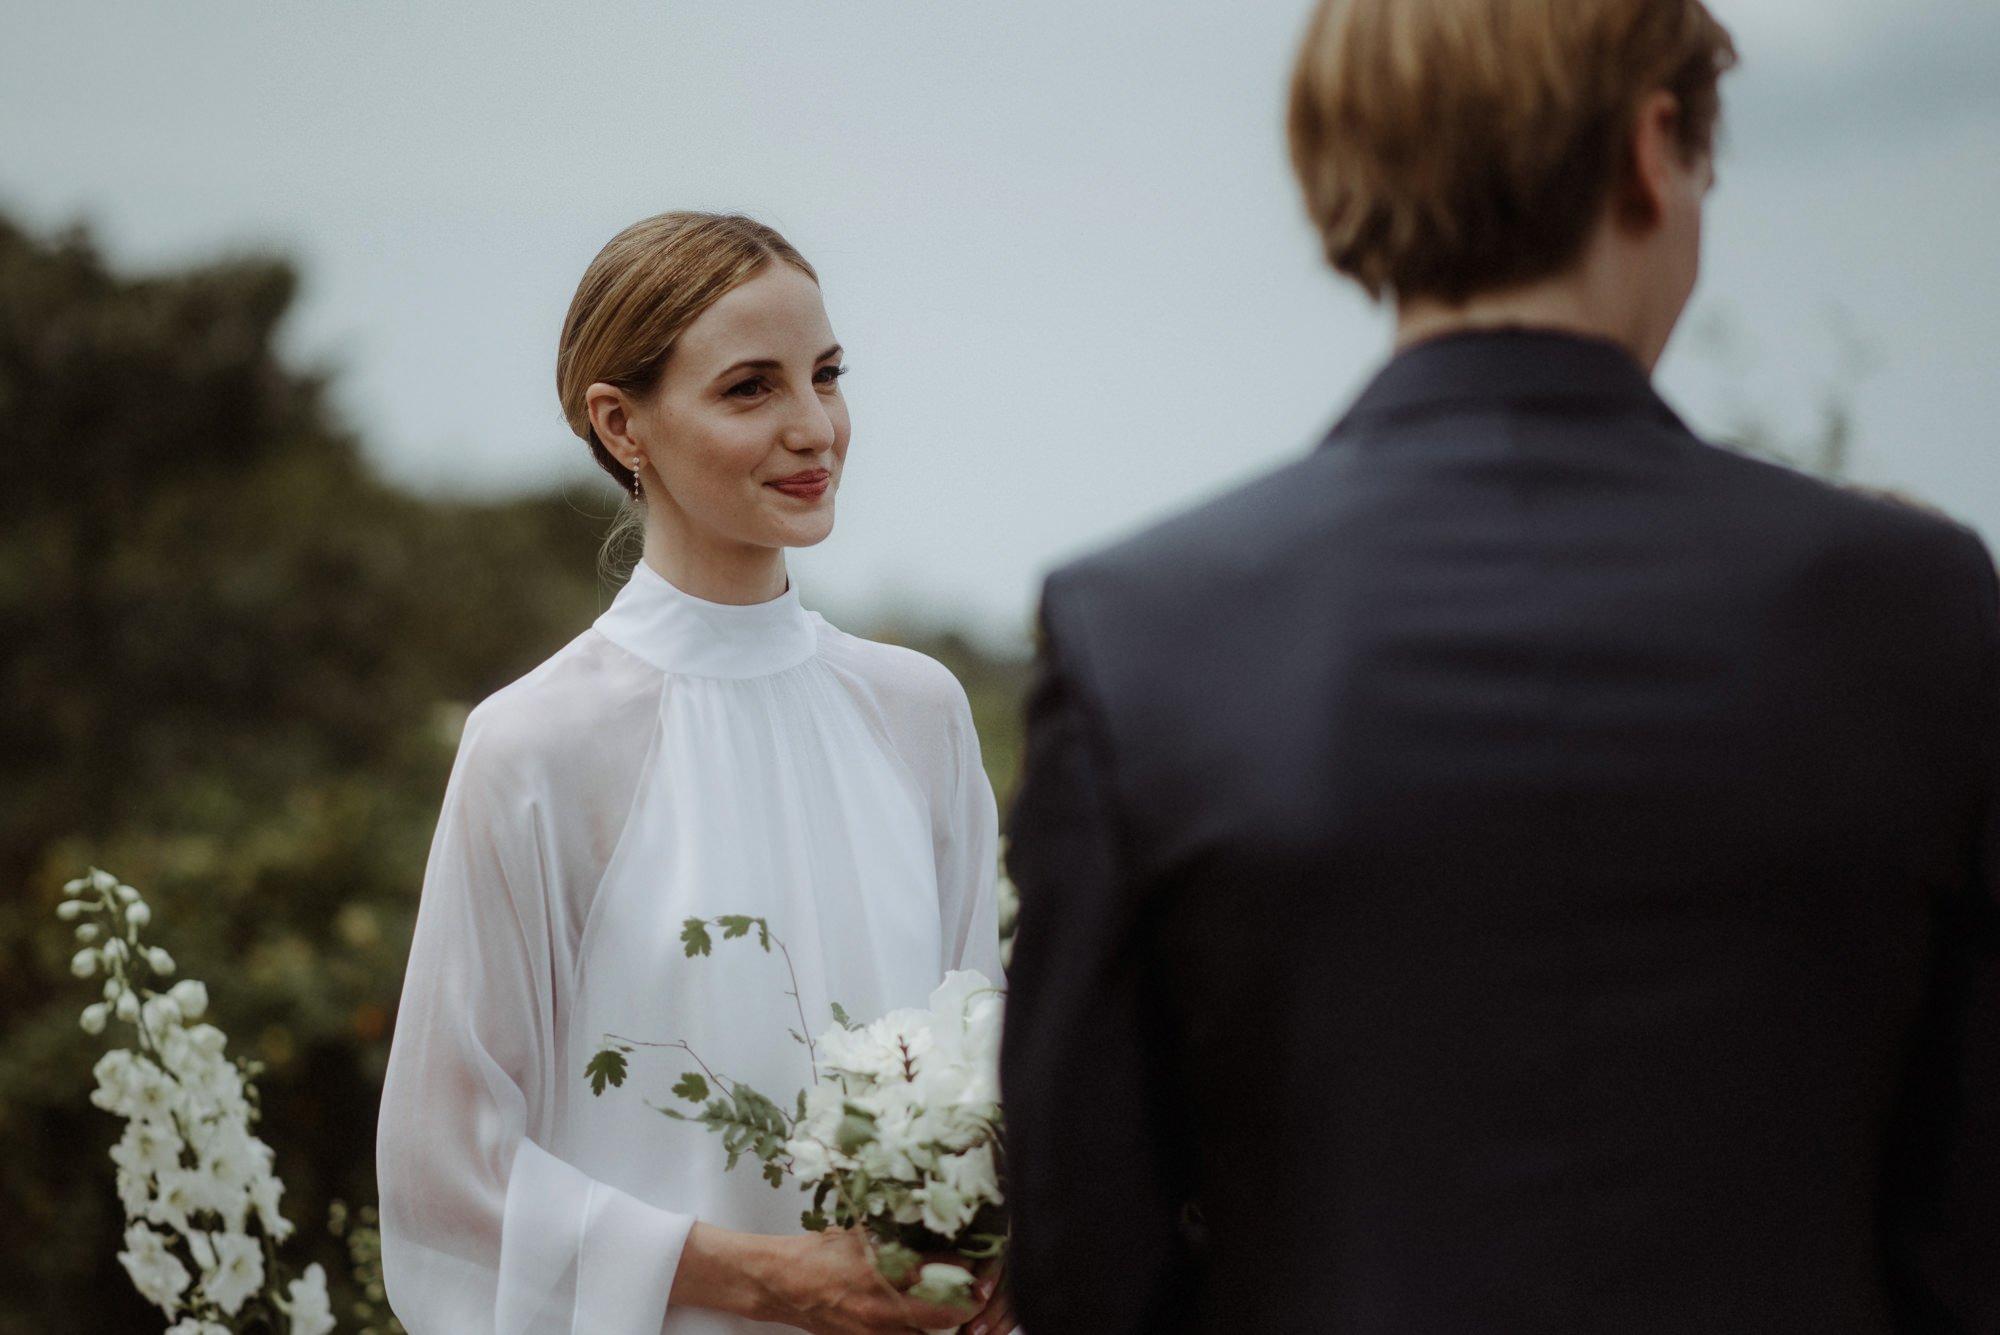 copenhagen wedding photographer 4422 2 1